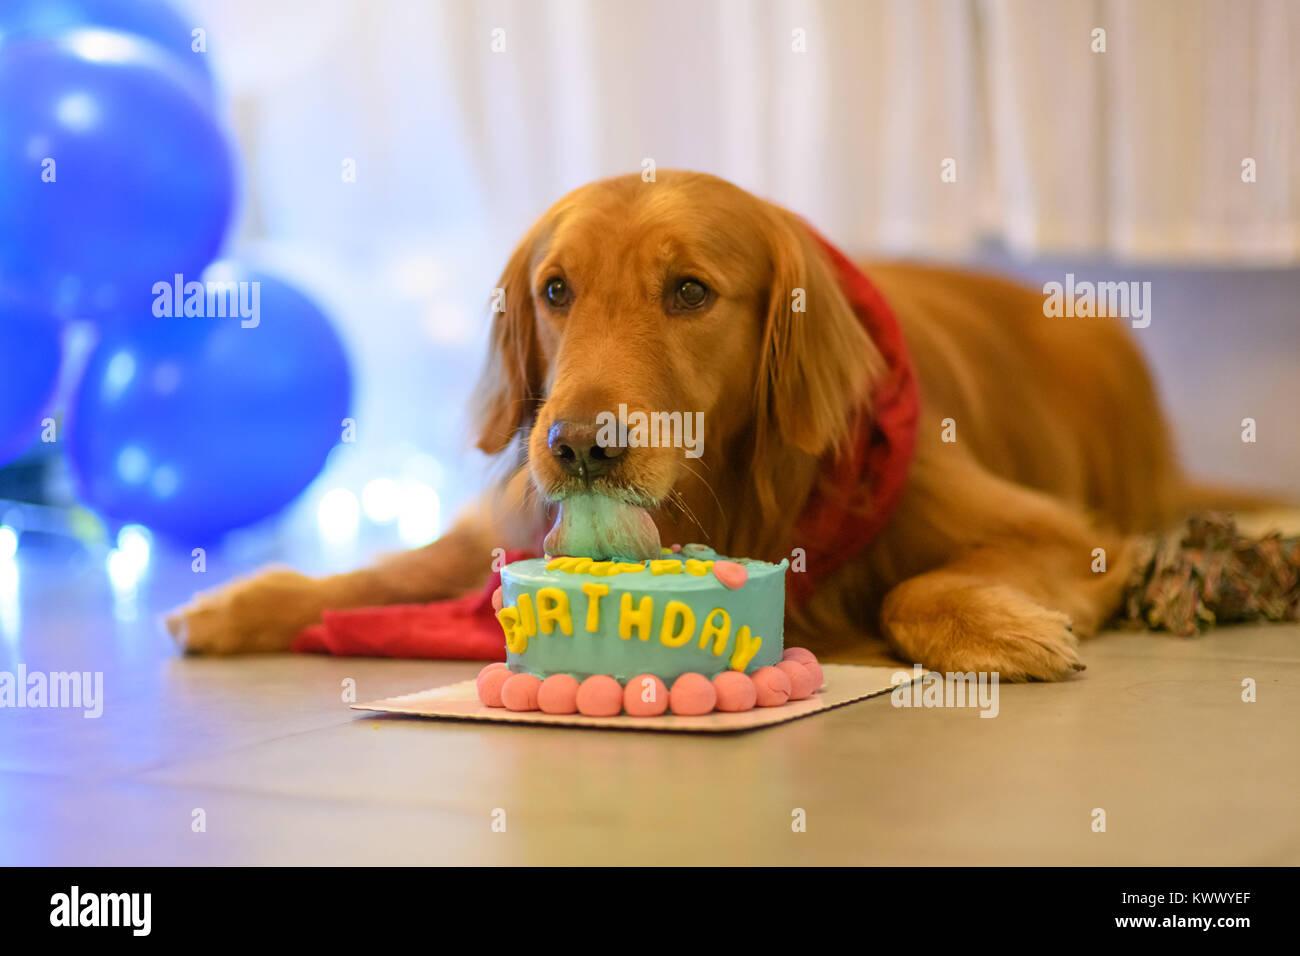 Sensational Golden Retriever And Birthday Cake Stock Photo 170830087 Alamy Funny Birthday Cards Online Alyptdamsfinfo